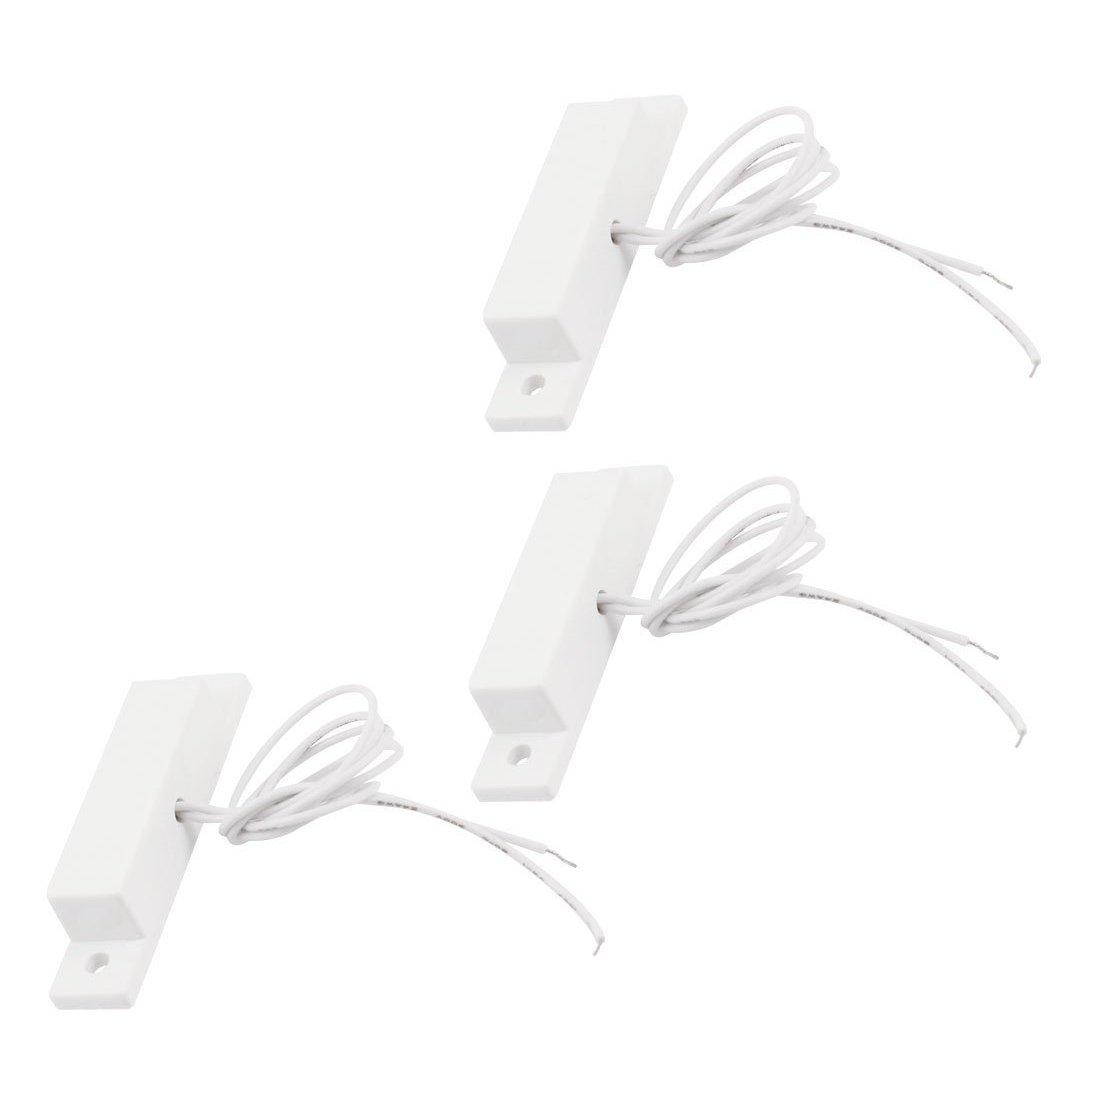 Cikuso 3pcs NO normal offen Verkabelt Sicherheit Alarm Tur Magnetkontakt Reed Schalter